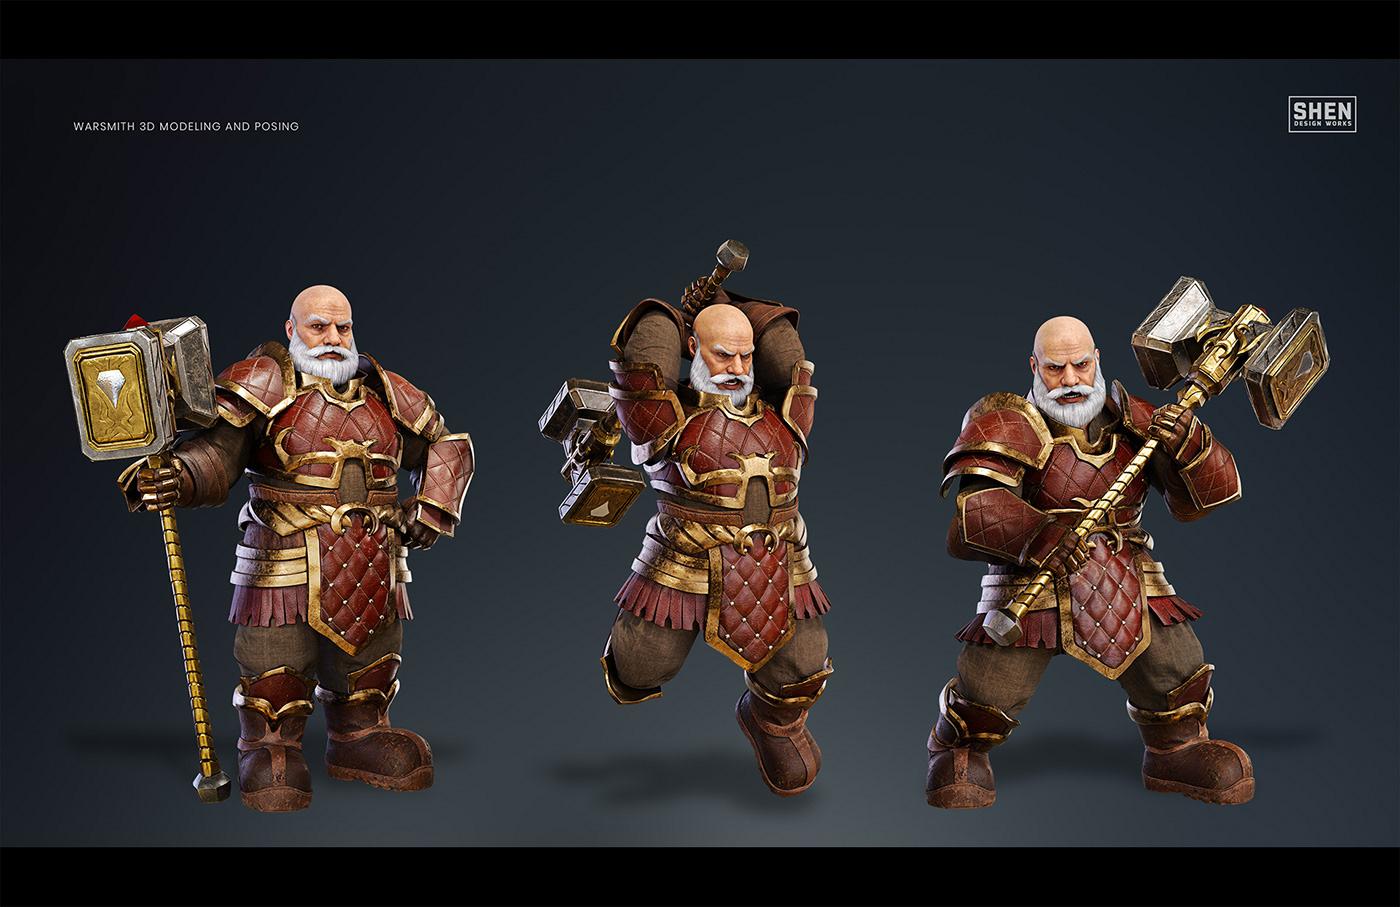 mobile games Video Games 3D model ILLUSTRATION  keyart marketing   character art